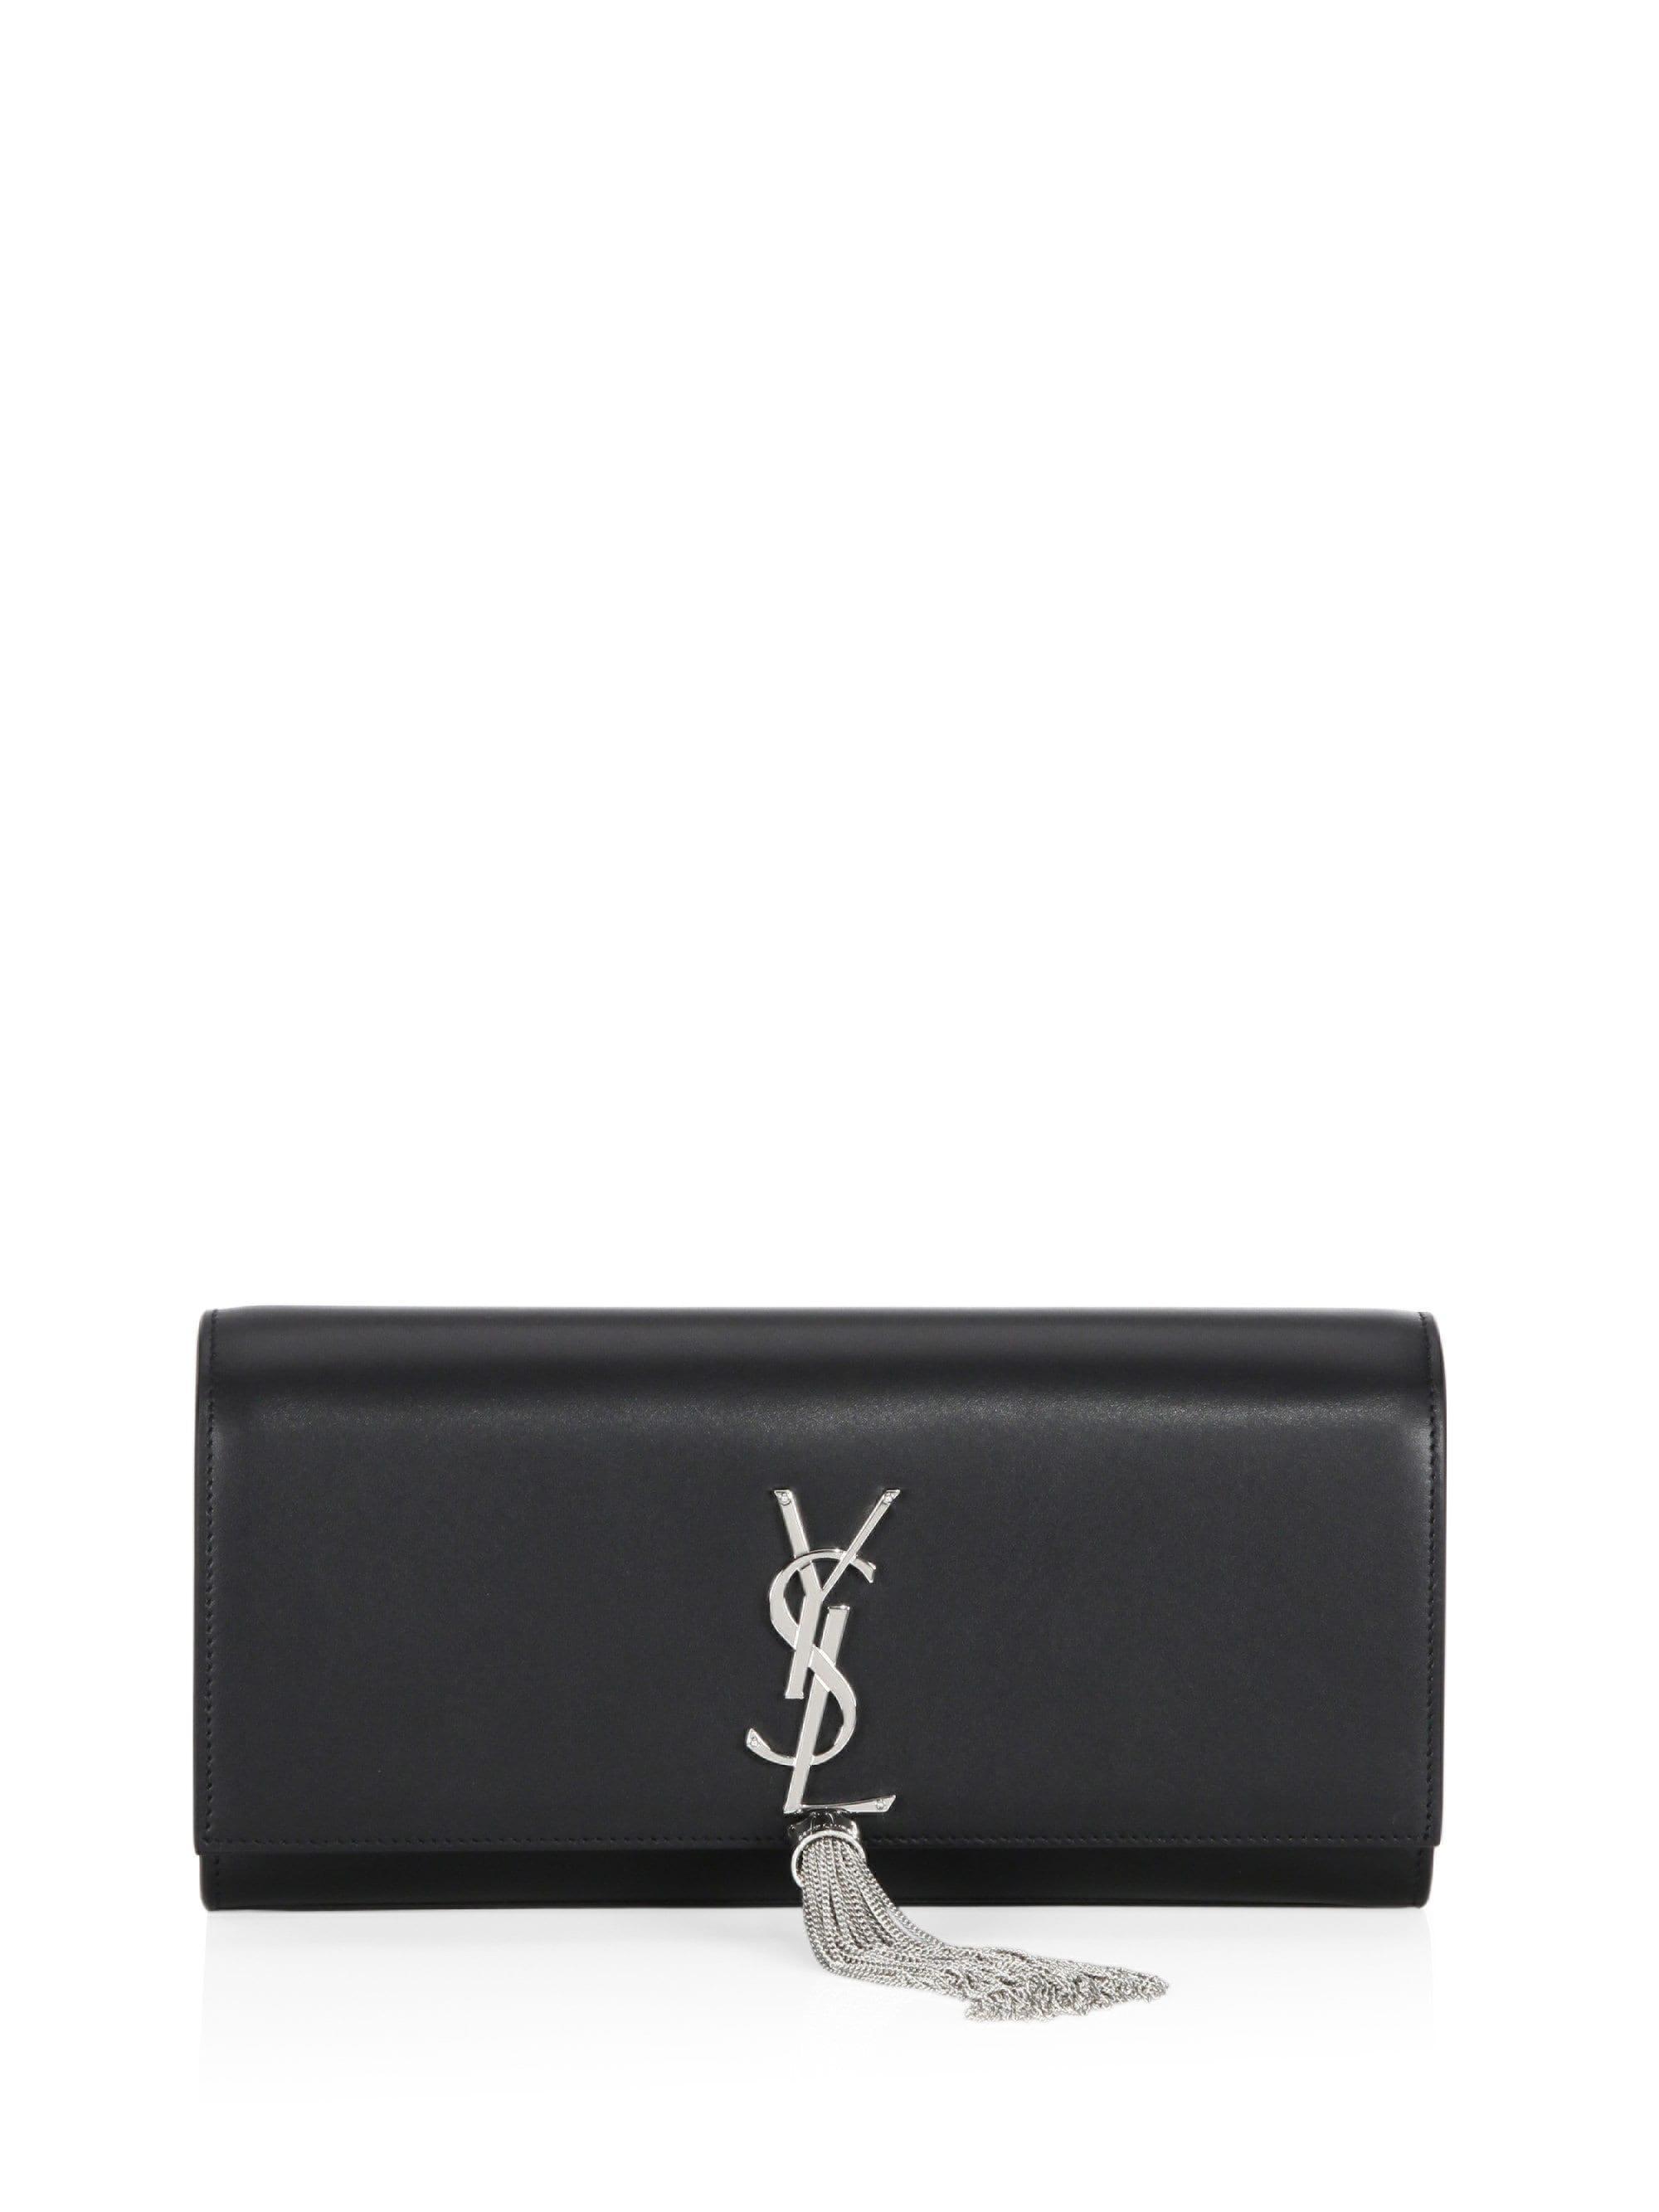 Lyst - Saint Laurent Small Kate Monogram Leather Tassel Clutch in Black 053620e97b3a9